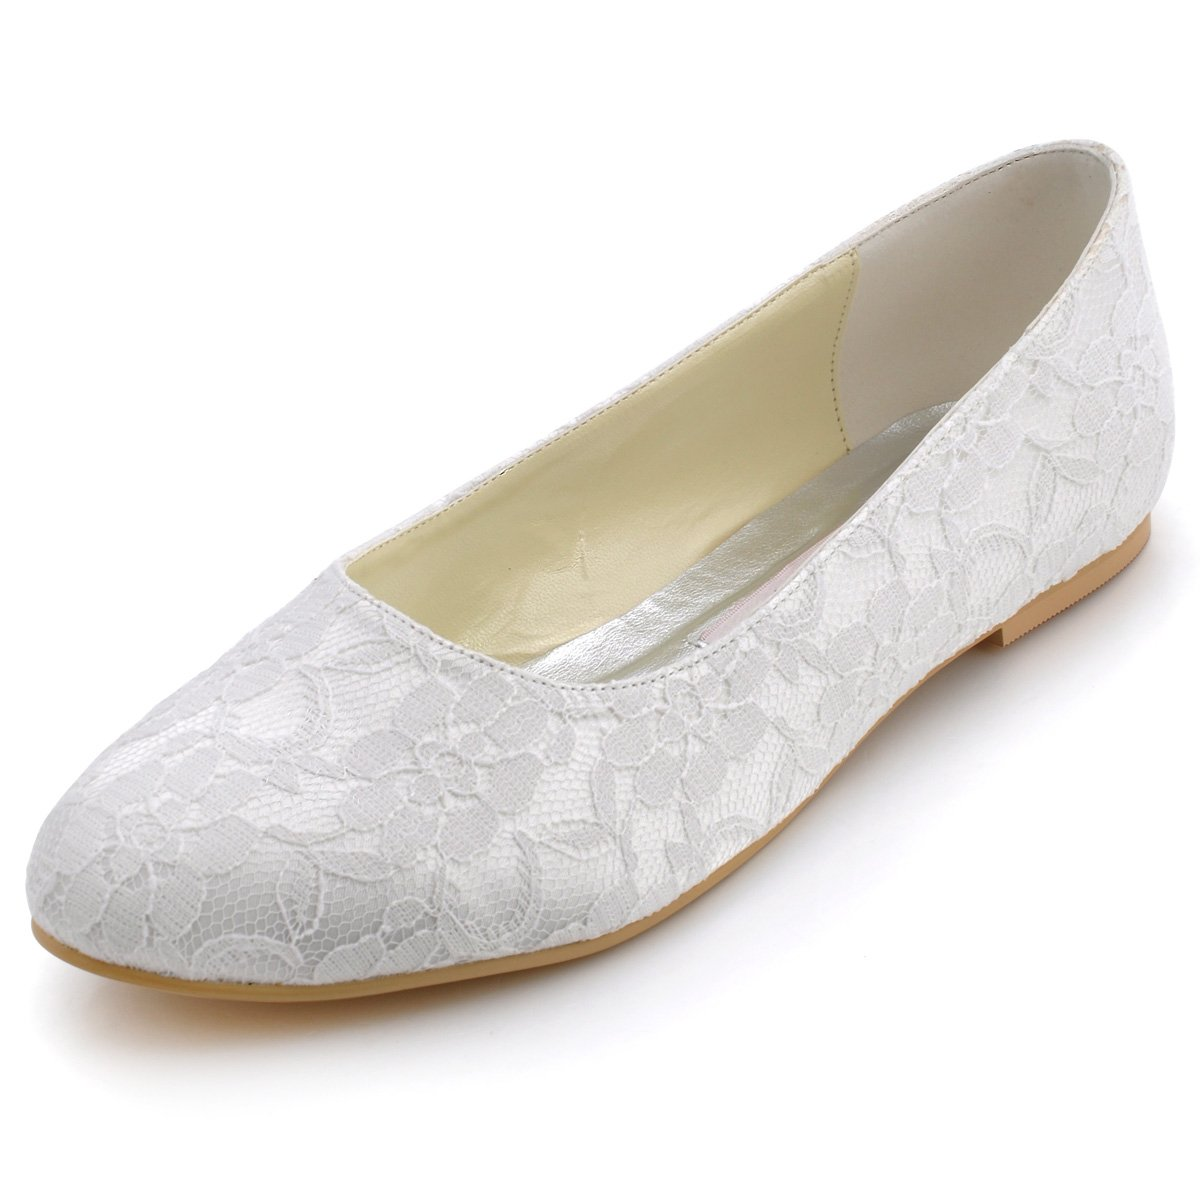 ElegantPark EP11106 Women Comfort Flats Closed Toe Lace Wedding Bridal Shoes White US 10